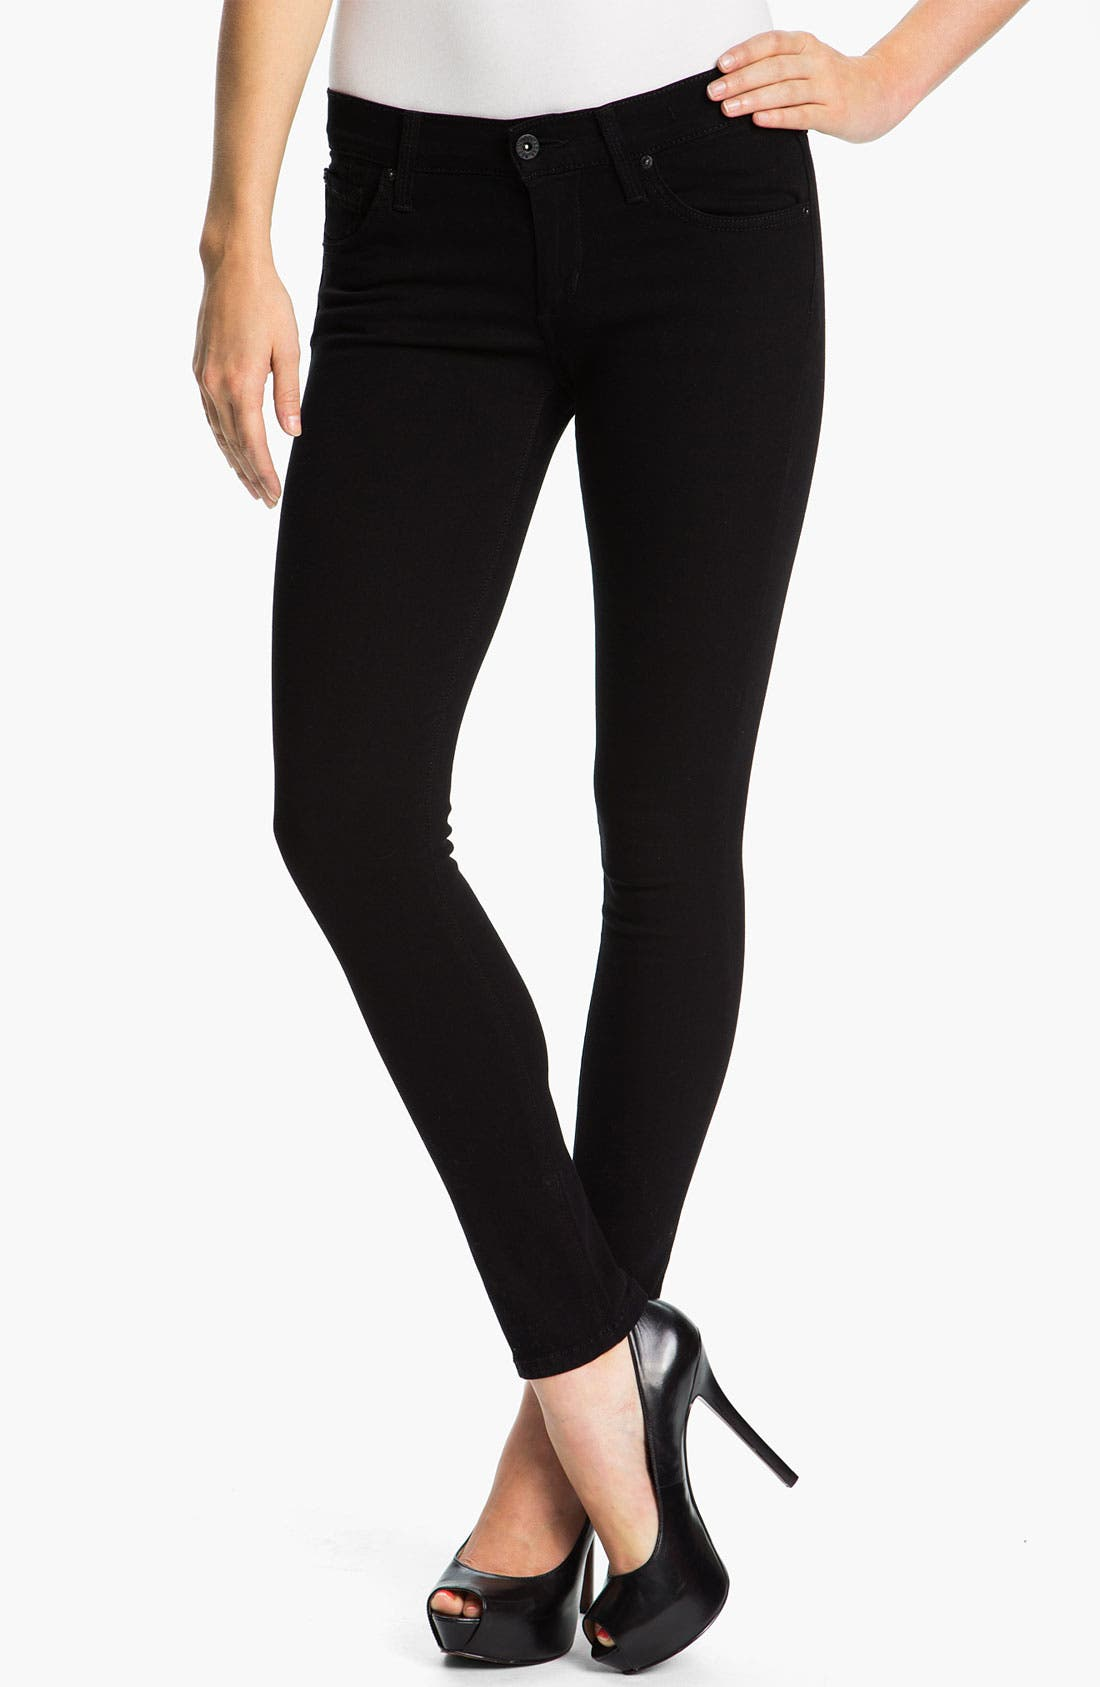 Alternate Image 1 Selected - James Jeans 'Ritchie' Slim Jeans (Black Clean) (Petite) (Online Exclusive)